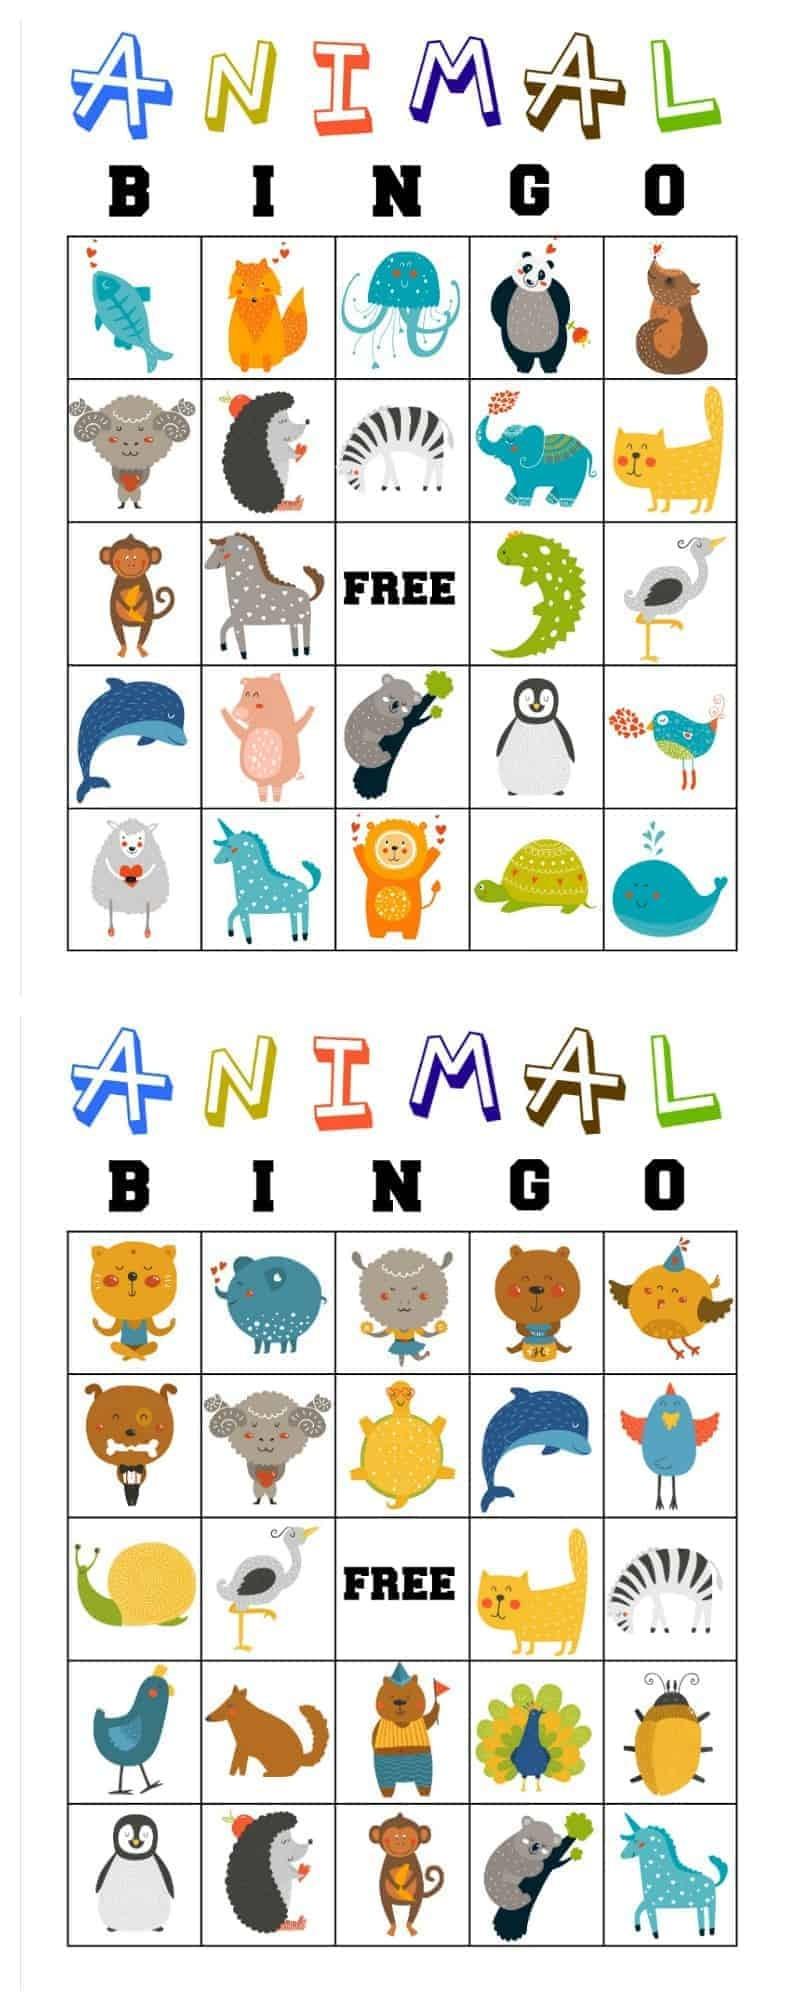 Free Printable Animal Bingo Cards For Toddlers And Preschoolers - Free Printable Bible Bingo For Preschoolers